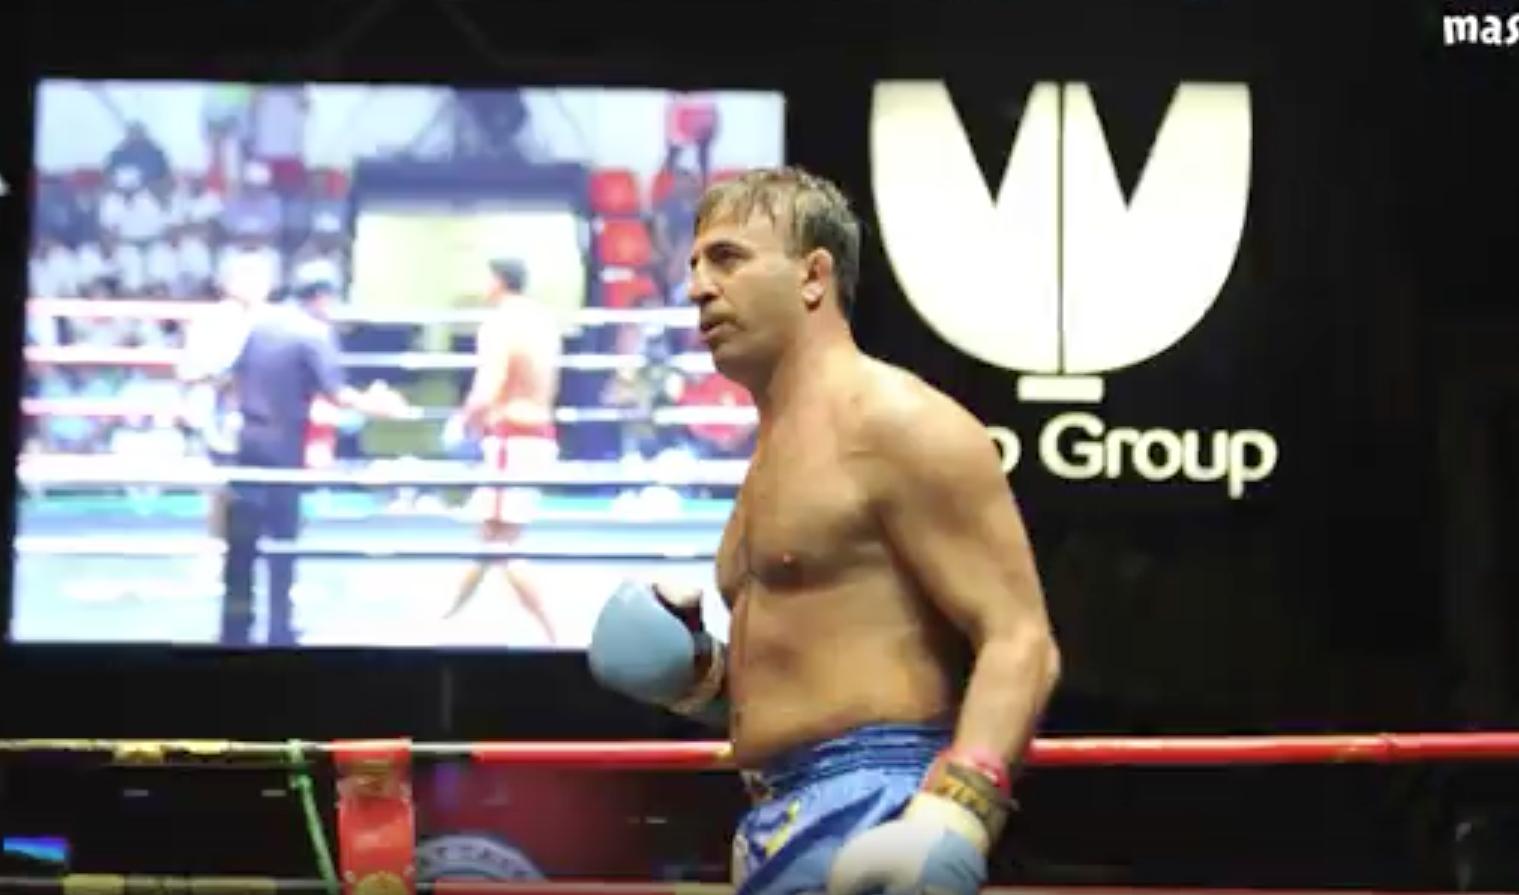 <p>Двухкратный чемпиона мира по ММА Салахатдин Аюпов / Фото: скриншот с youtube</p>